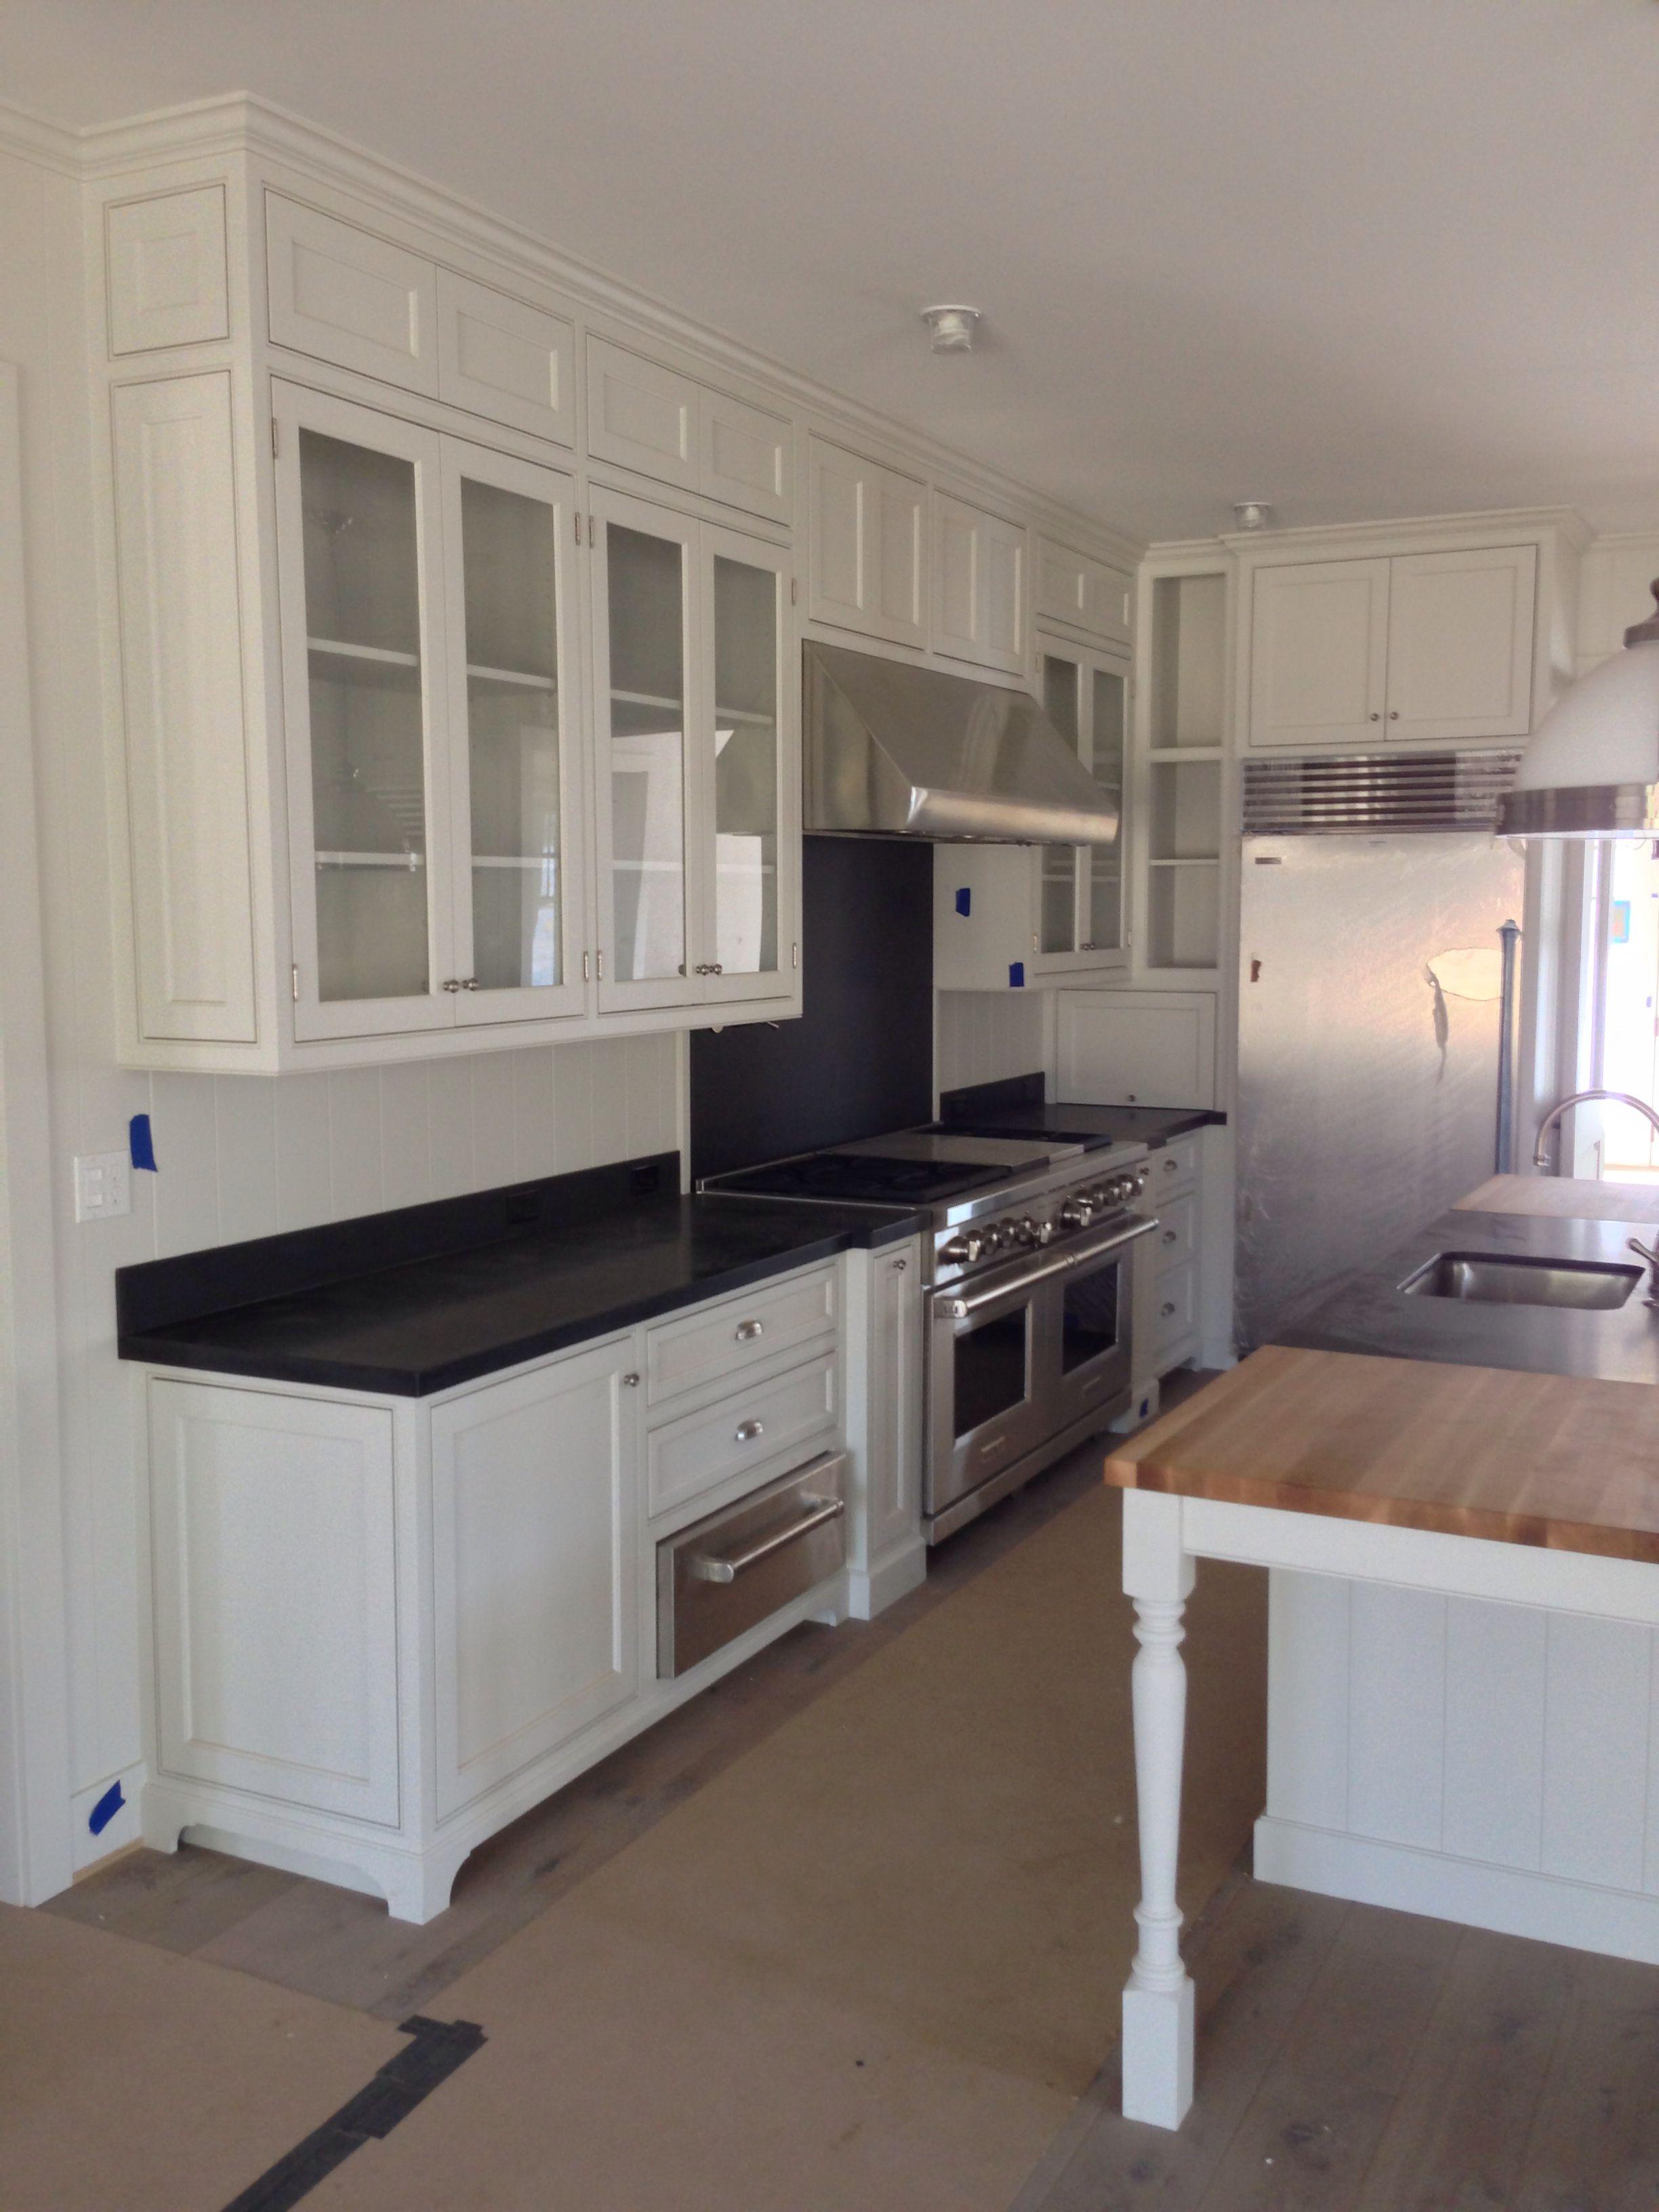 Flush inset paint grade | Home decor, Kitchen cabinets, Home